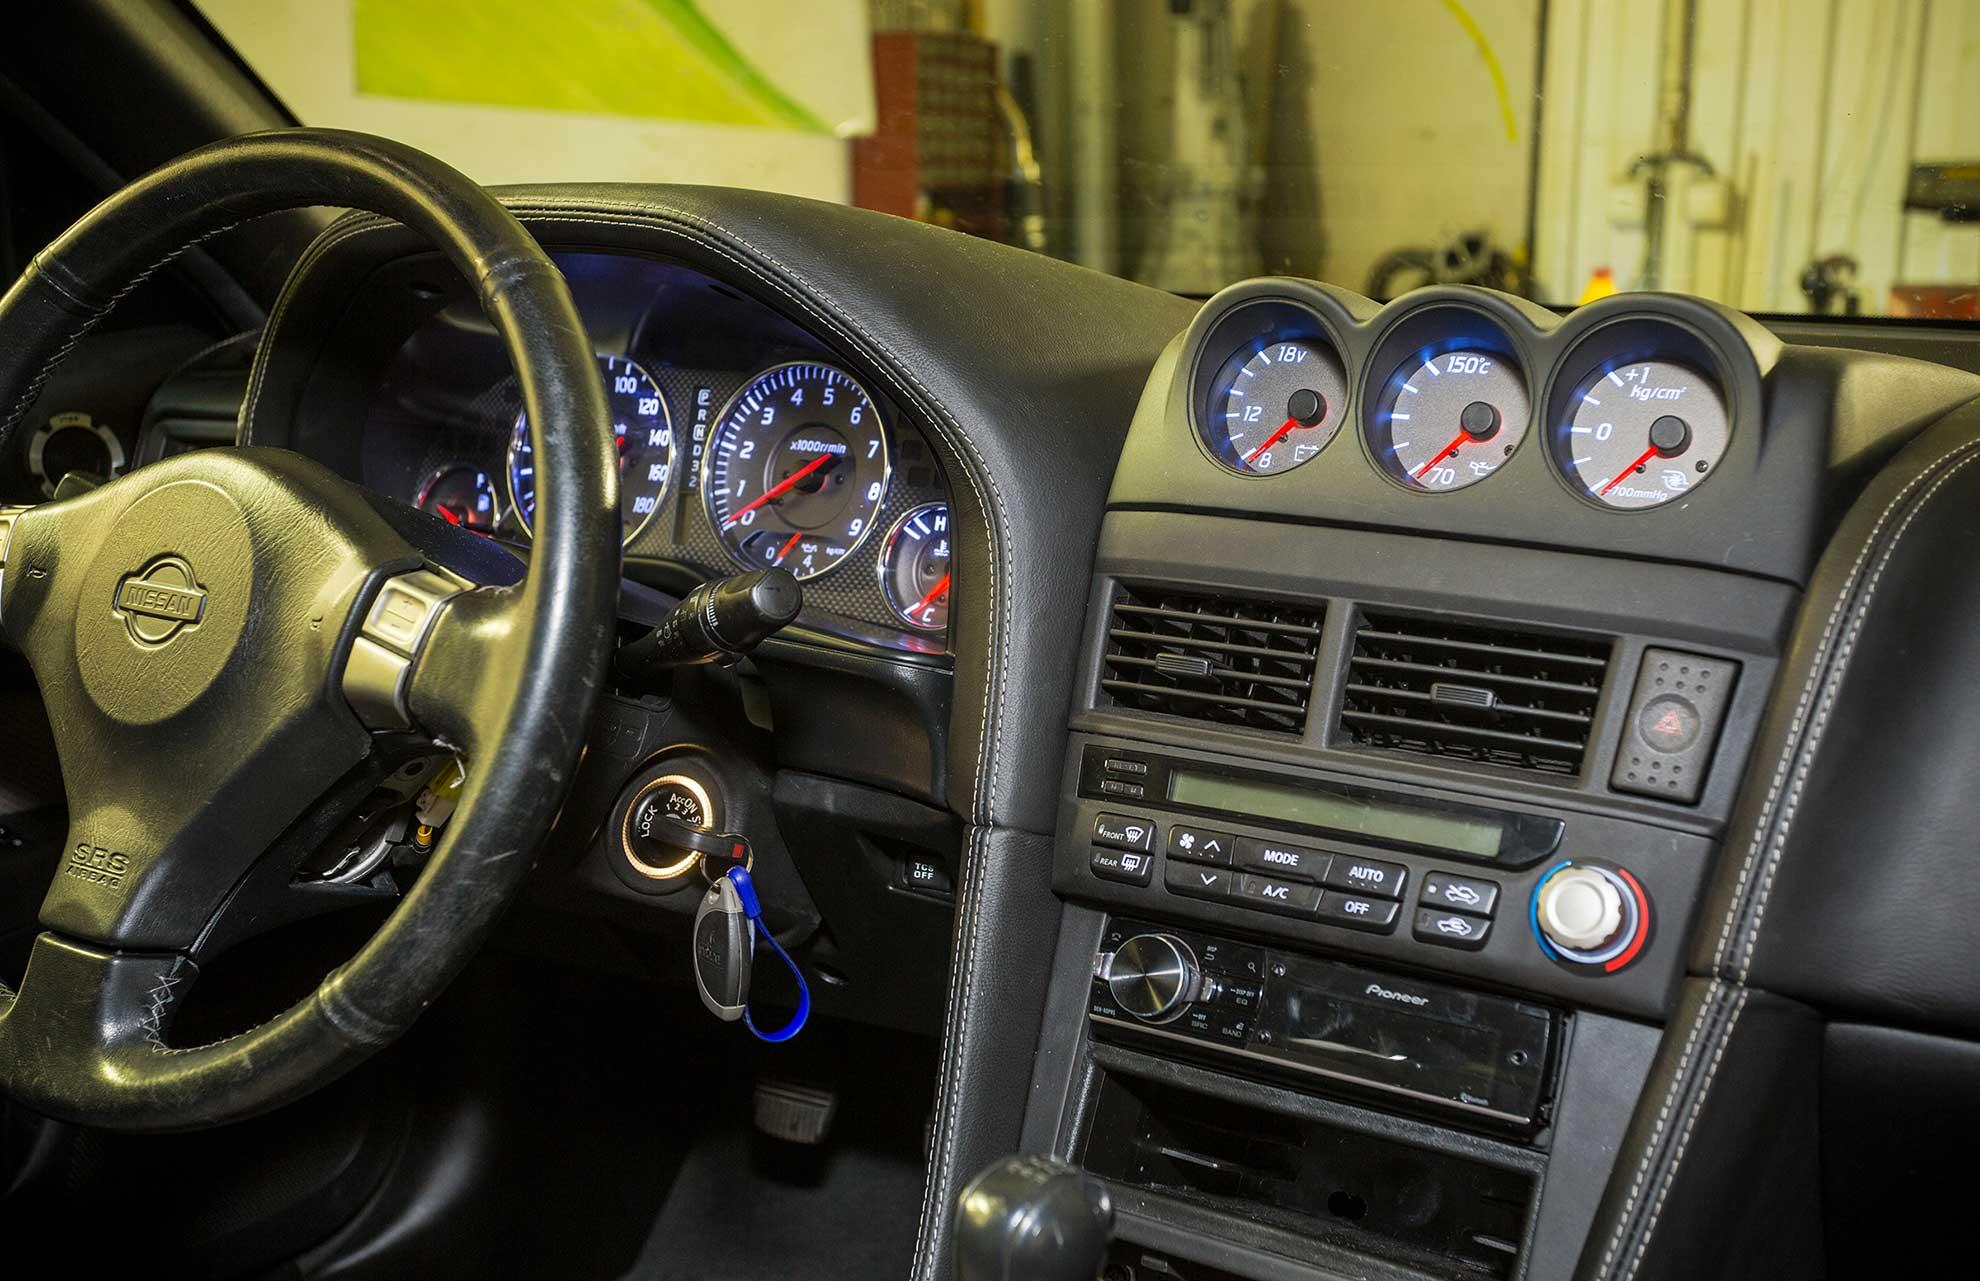 1999 Nissan Skyline Gtr R34 For Sale >> Nissan Skyline R34 LHD Left hand drive dashboard - Kageki ...